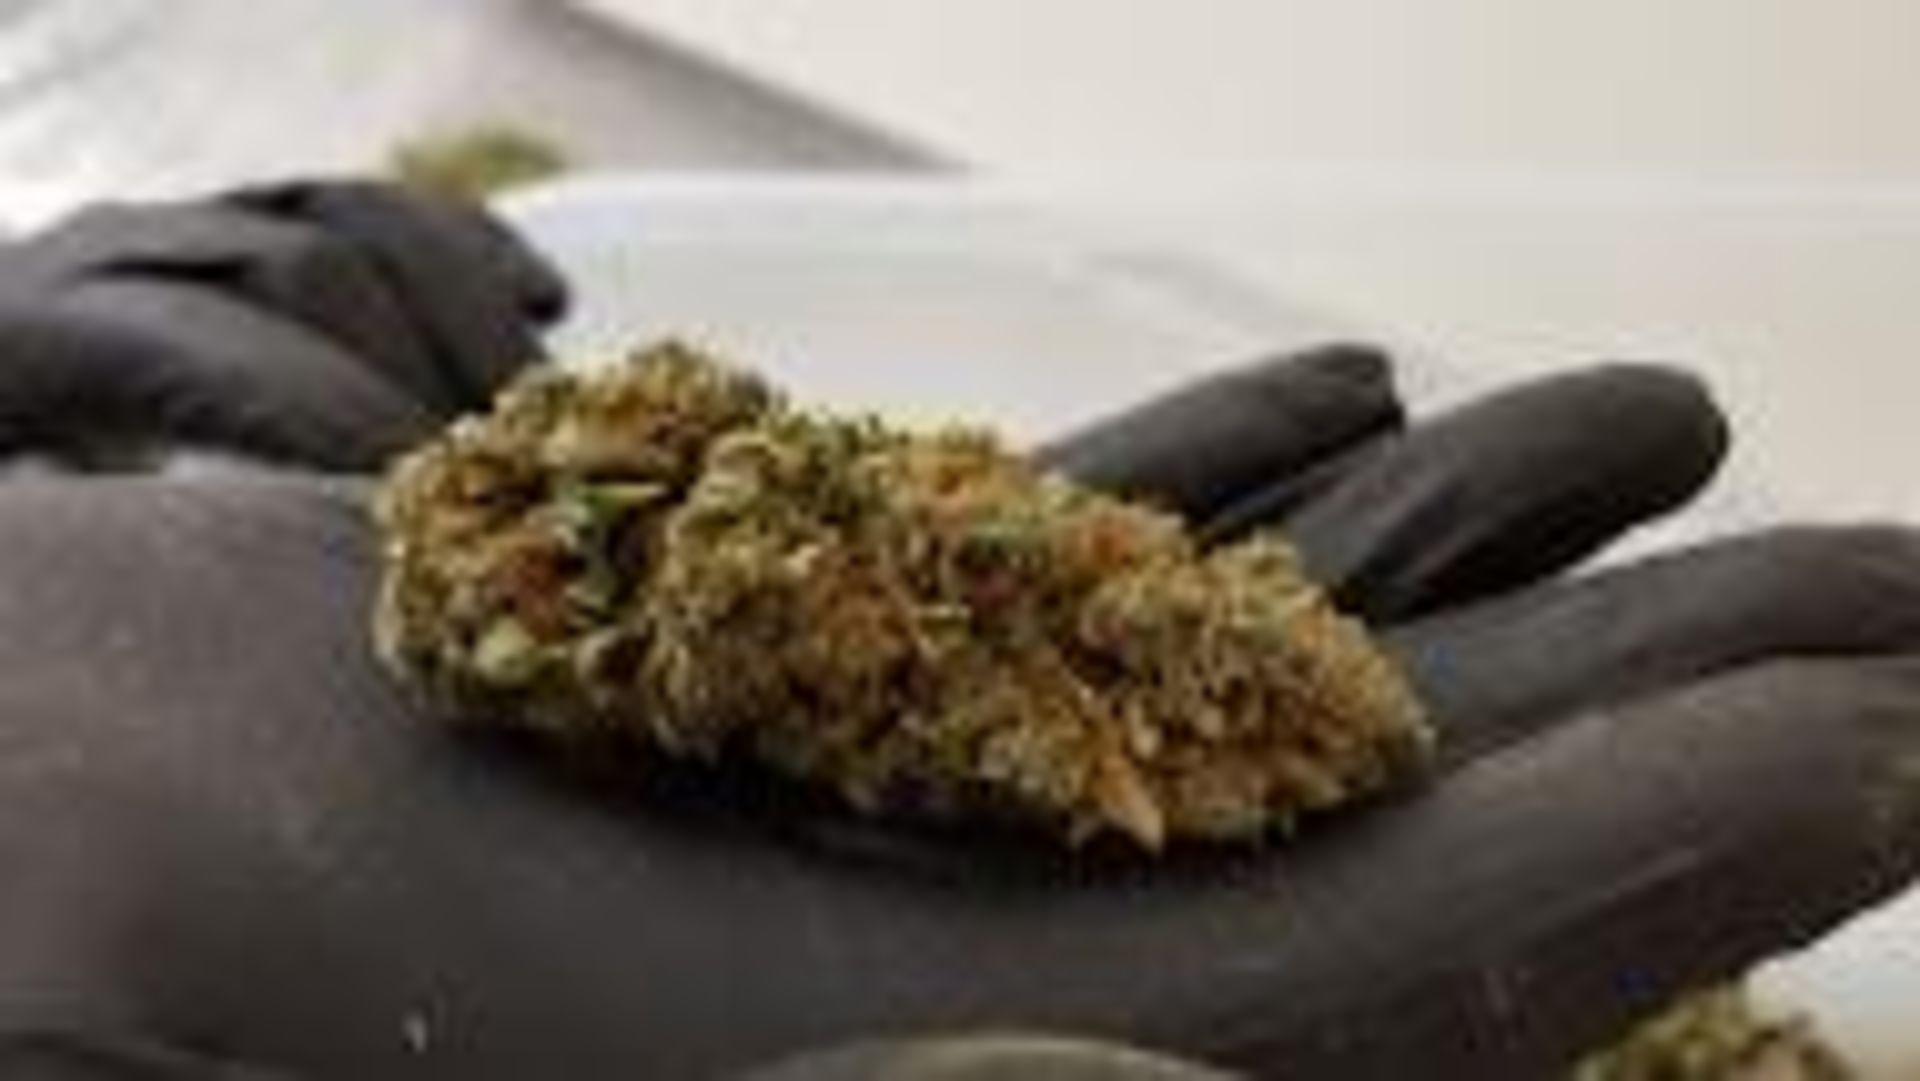 Unused/FactoryNew Revolution Cannabis & Hemp Flower Finisher System Model RDF 4300.100-200 lbs/8 hrs - Image 24 of 32